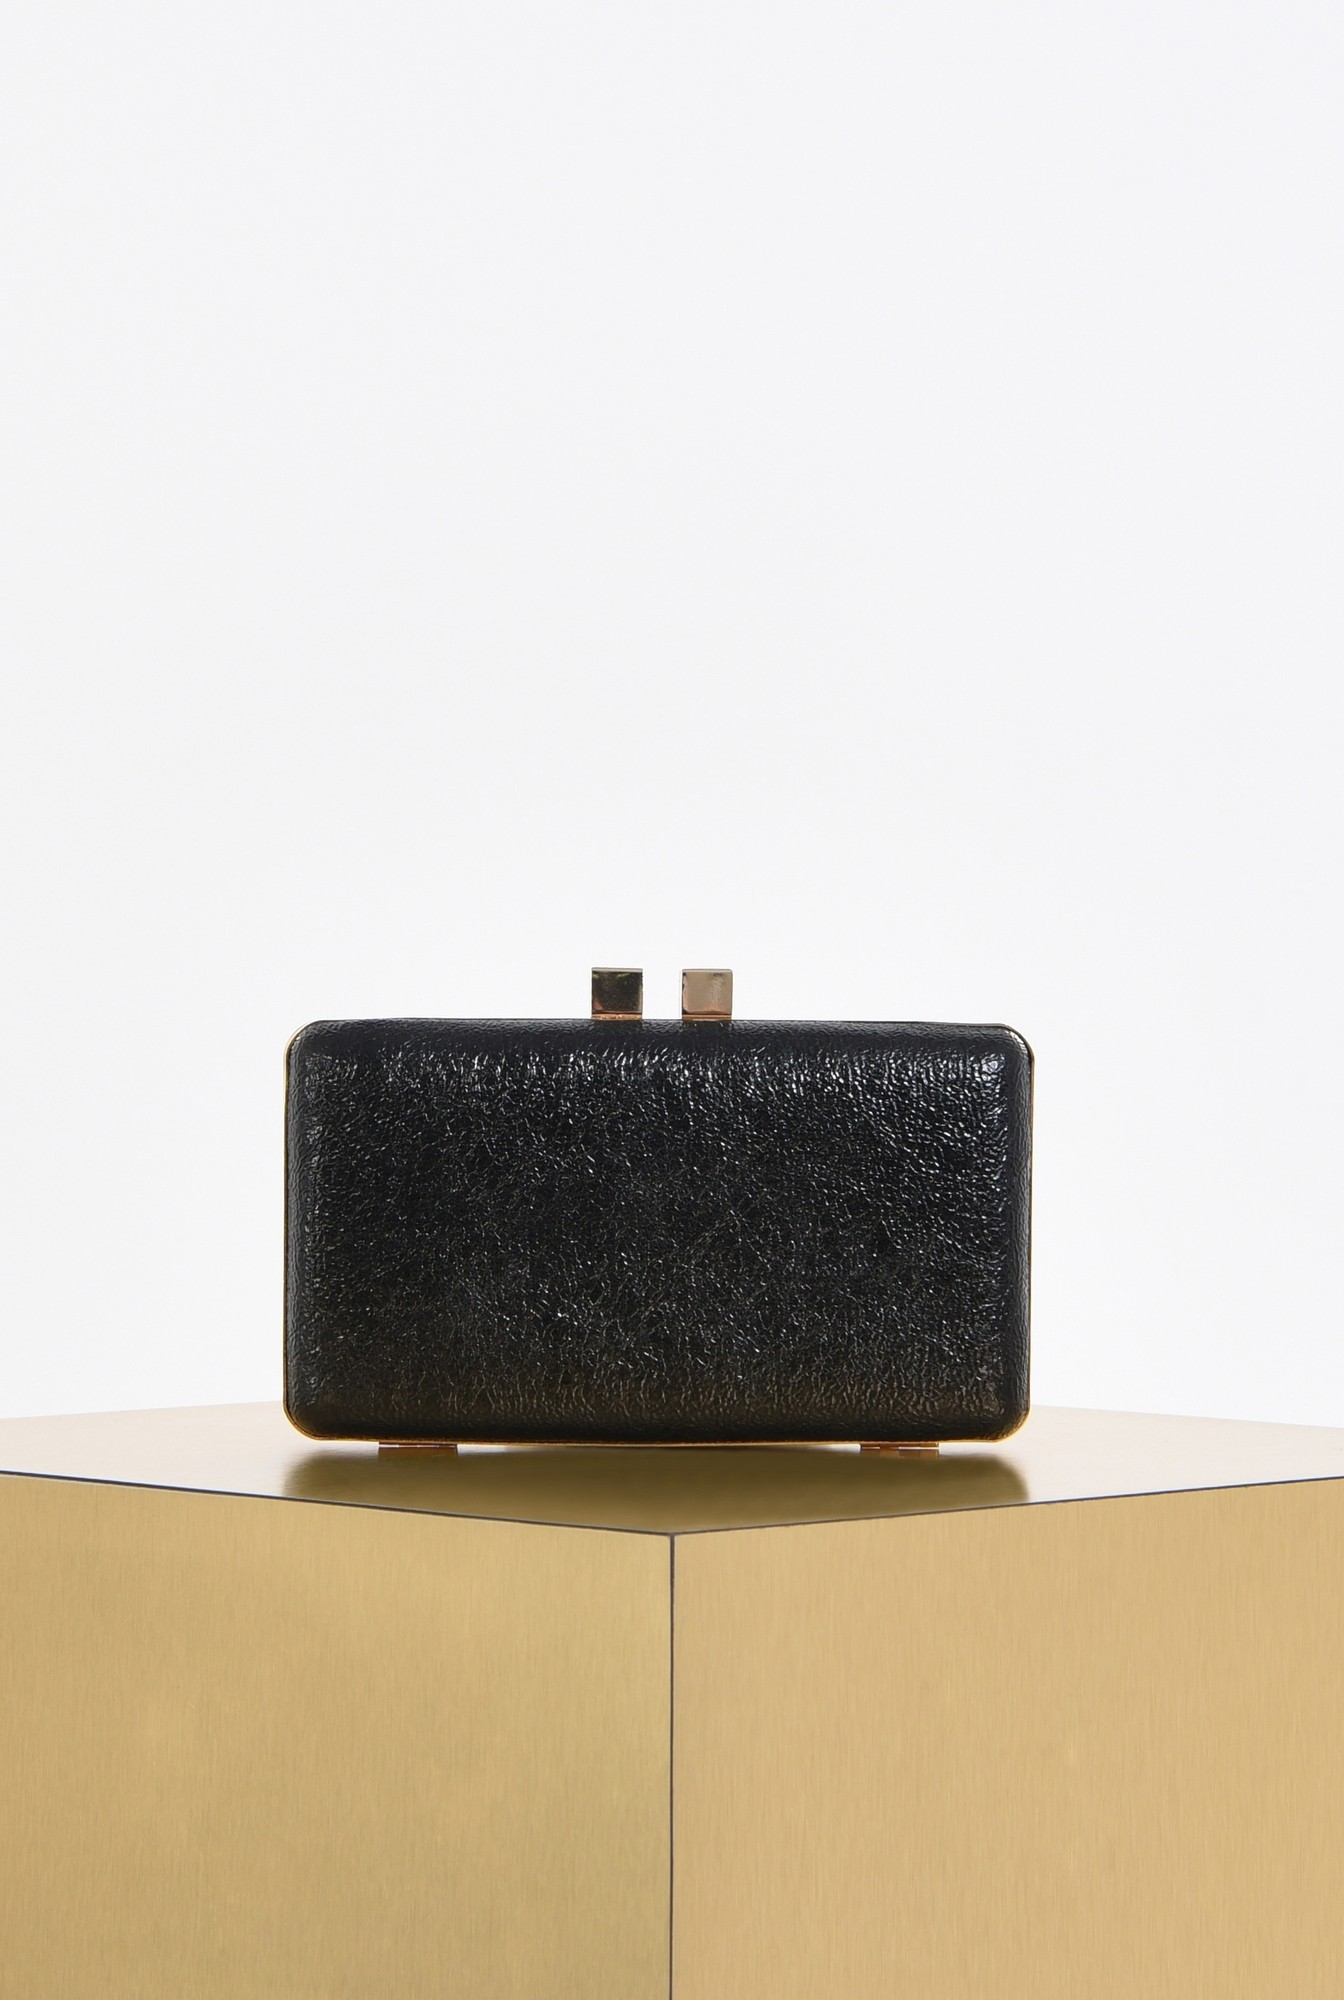 0 - plic elegant, negru, mini, grofrat, lant auriu